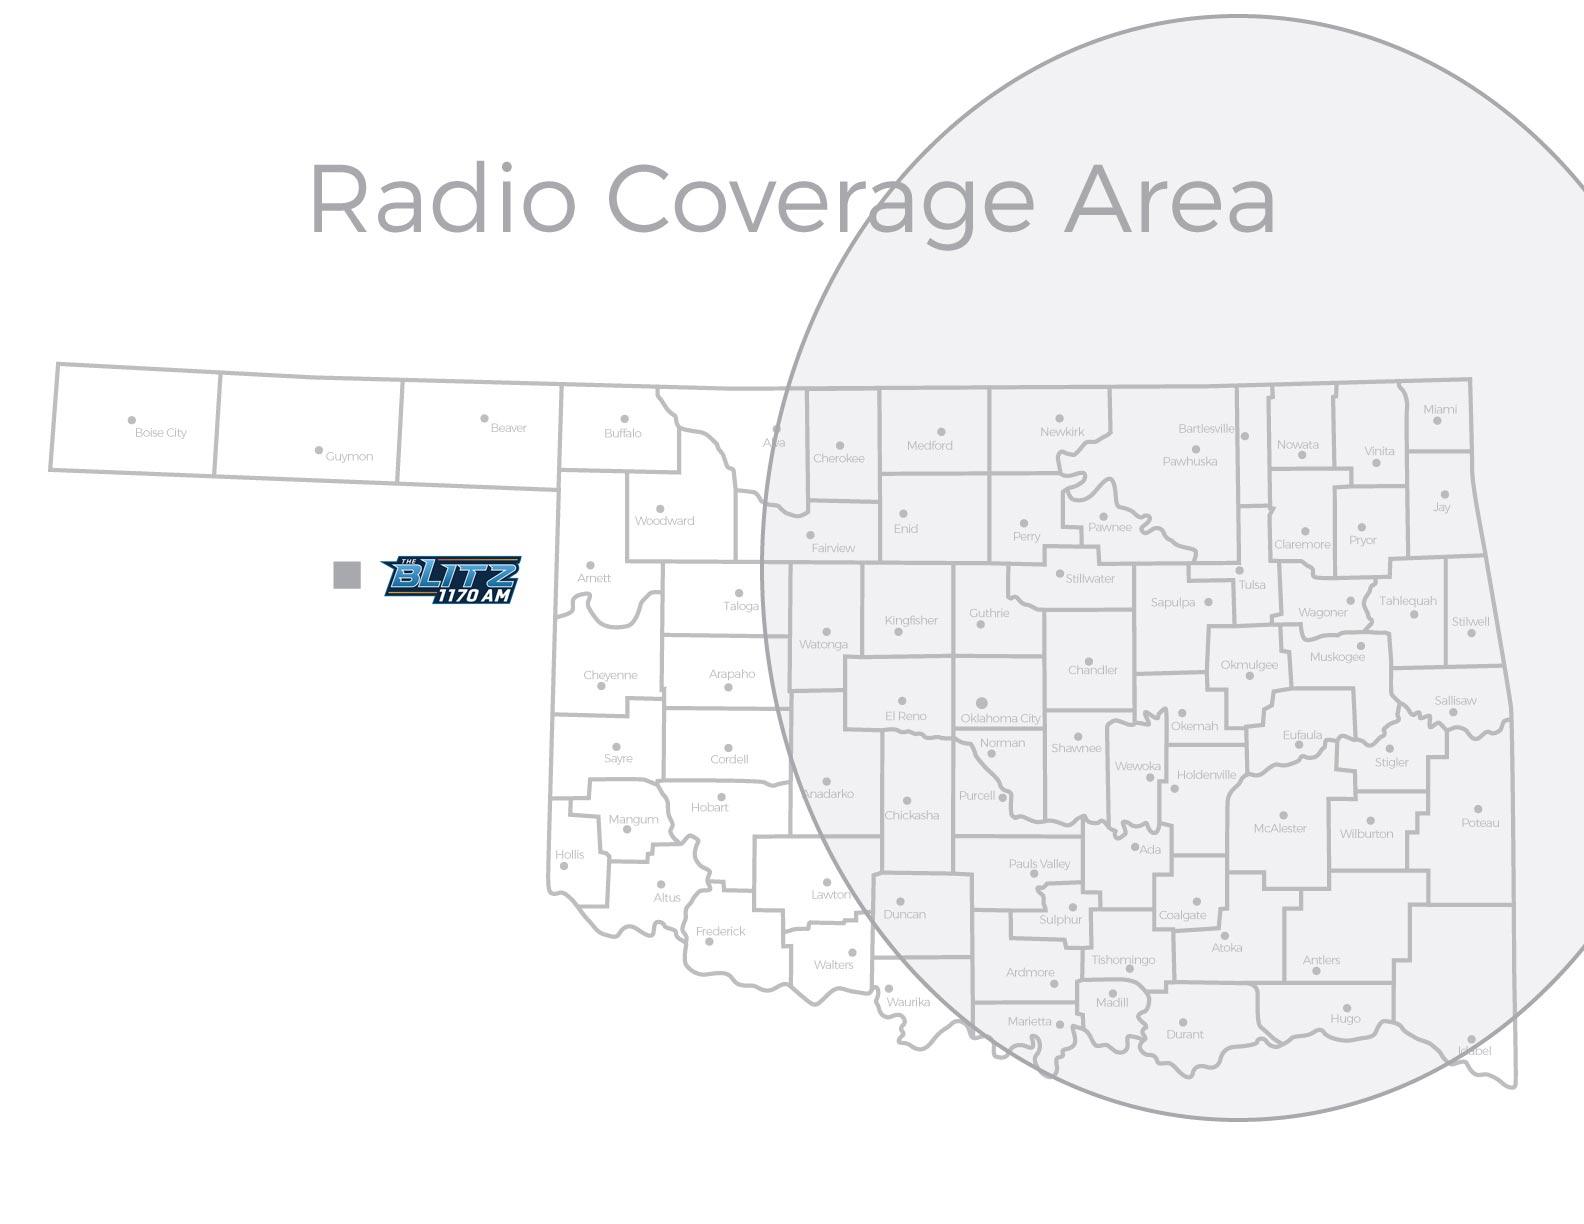 kfaq coverage map